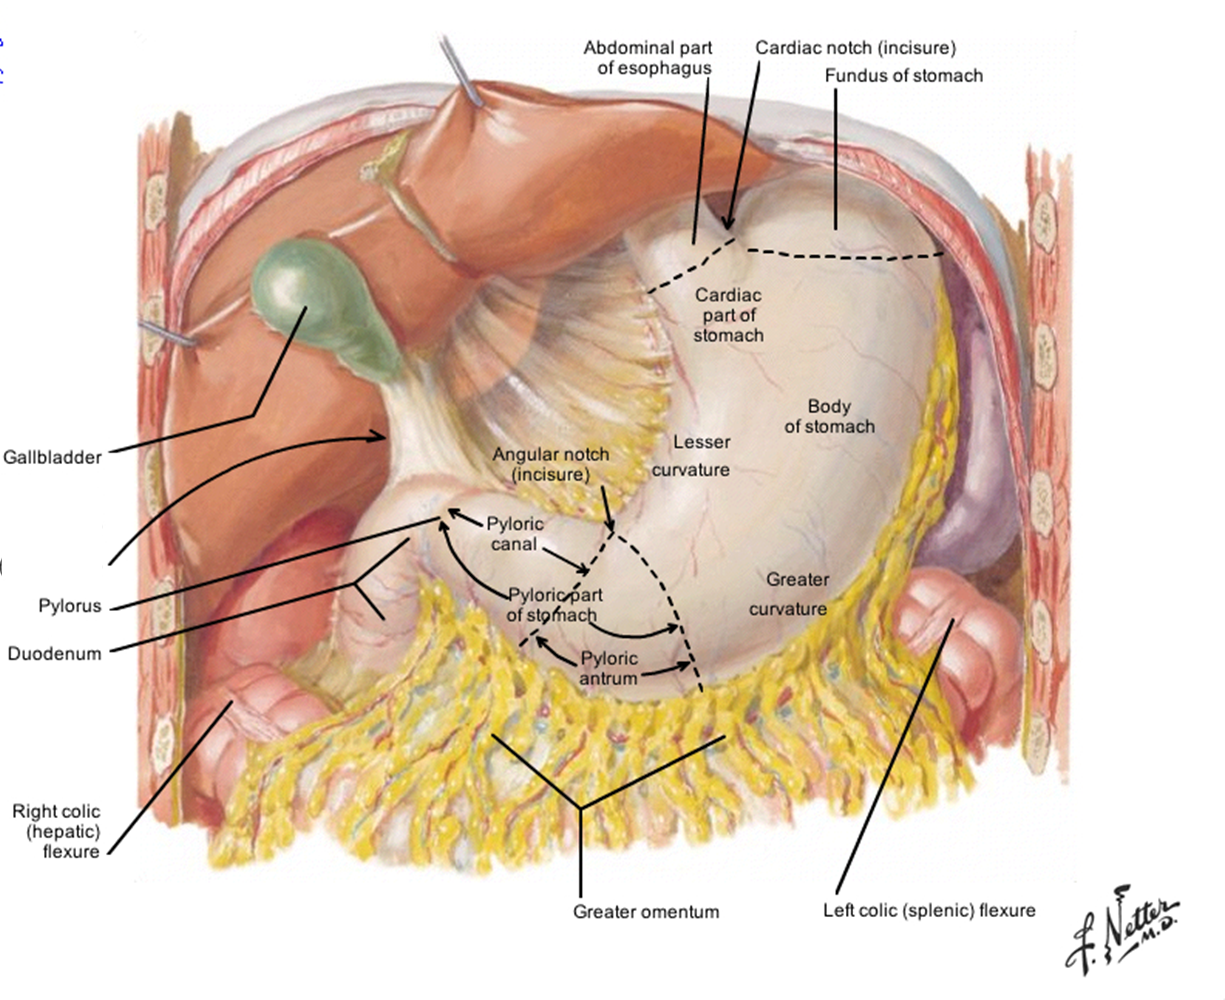 Stomach anatomy google search nurse stuff pinterest anatomy stomach anatomy google search ccuart Choice Image